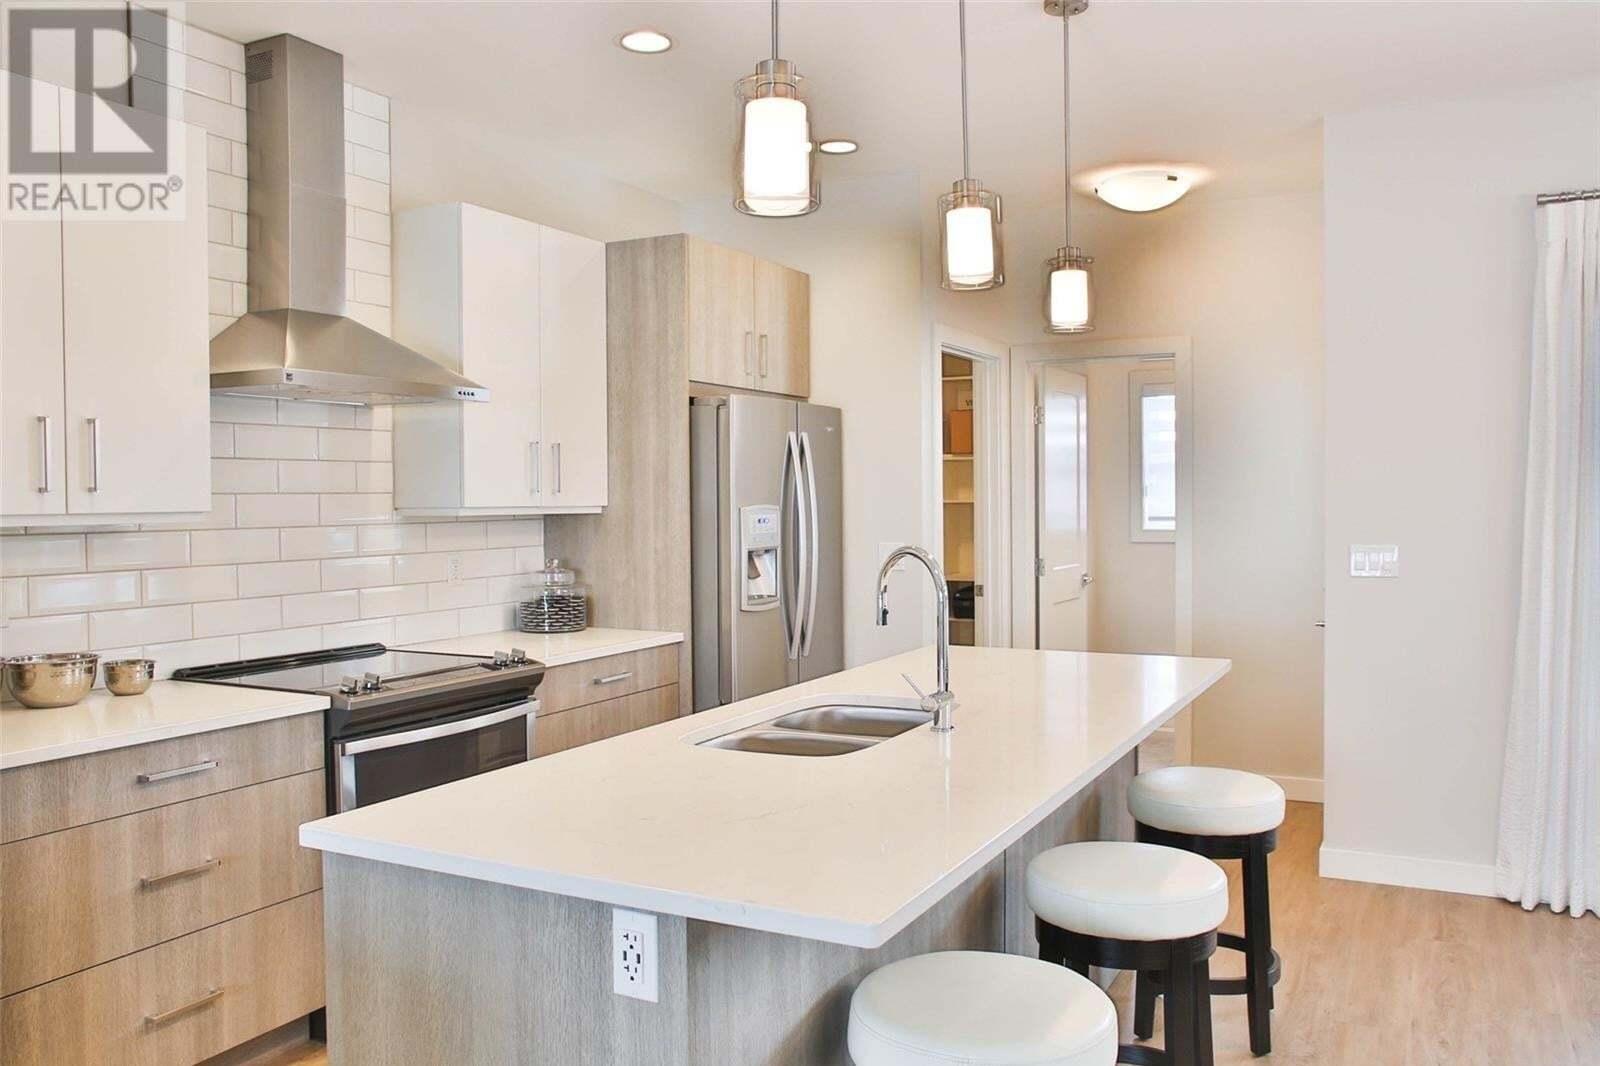 Townhouse for sale at 715 Evergreen Blvd Saskatoon Saskatchewan - MLS: SK828320